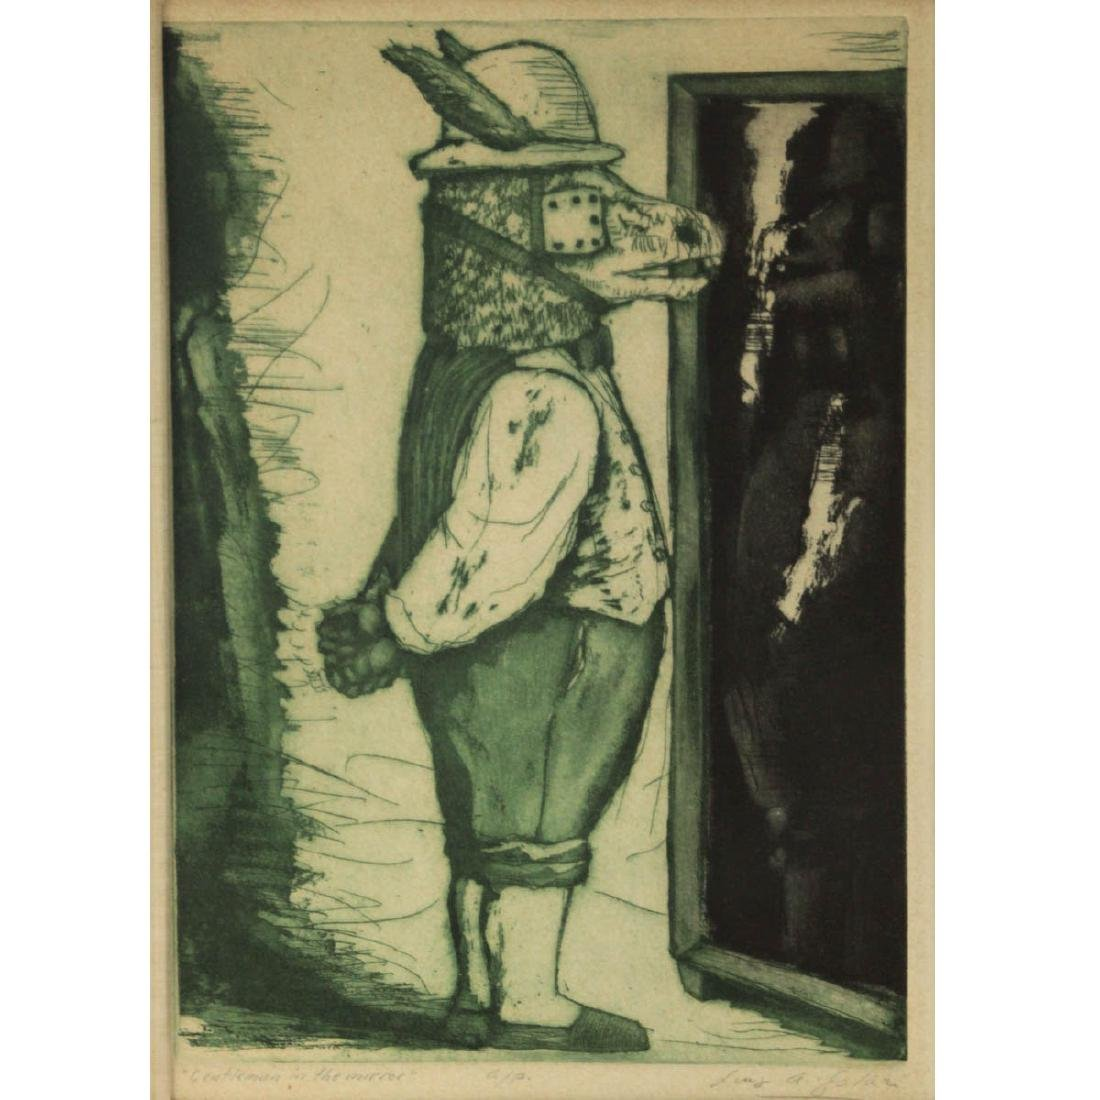 Luis Alberto Solari - Gentleman in The Mirror, Etching.